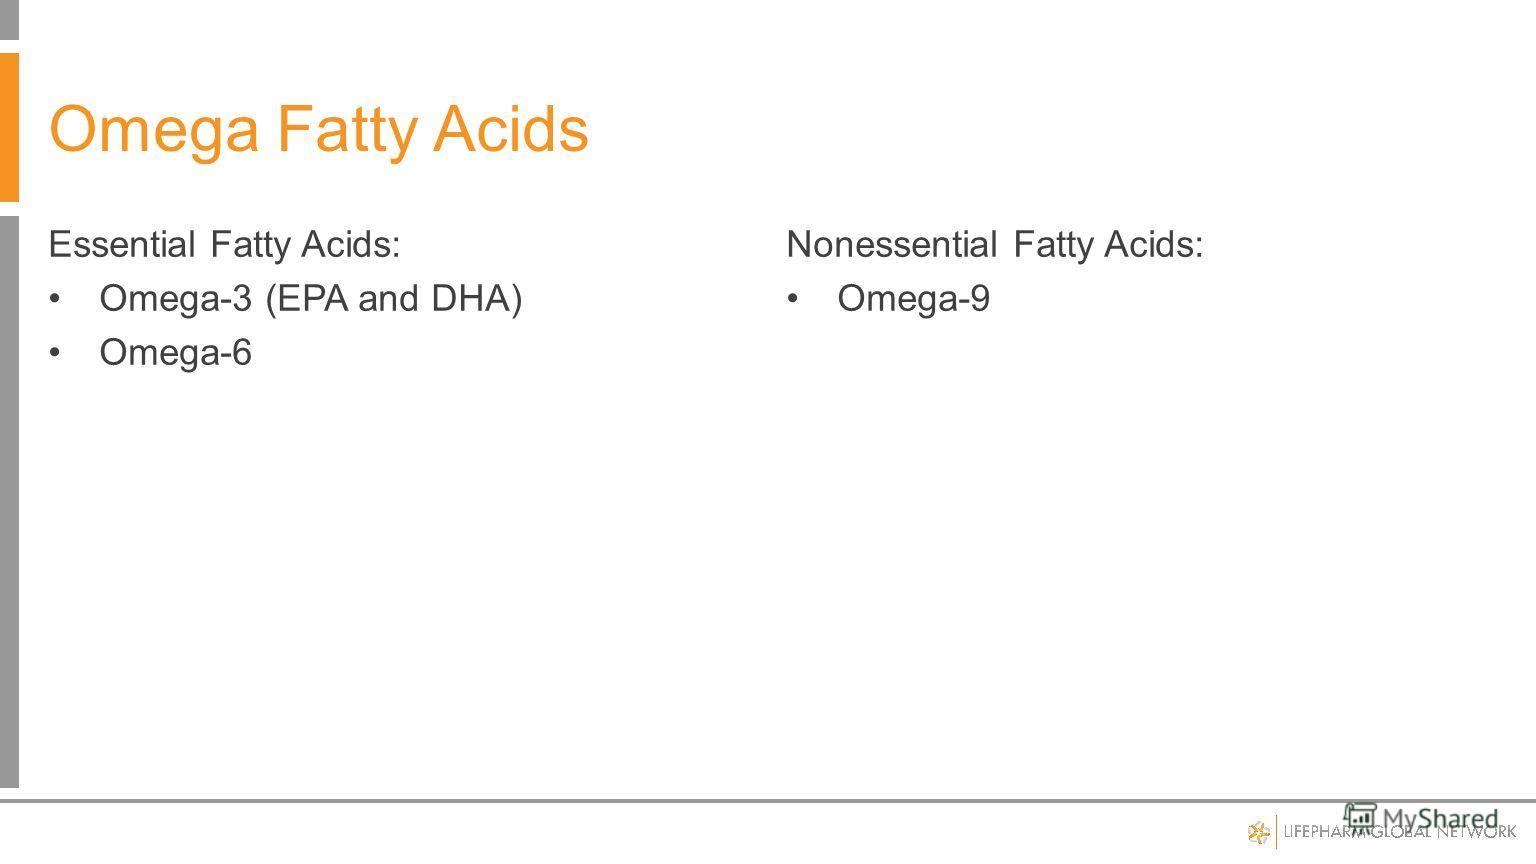 Essential Fatty Acids: Omega-3 (EPA and DHA) Omega-6 Nonessential Fatty Acids: Omega-9 Omega Fatty Acids